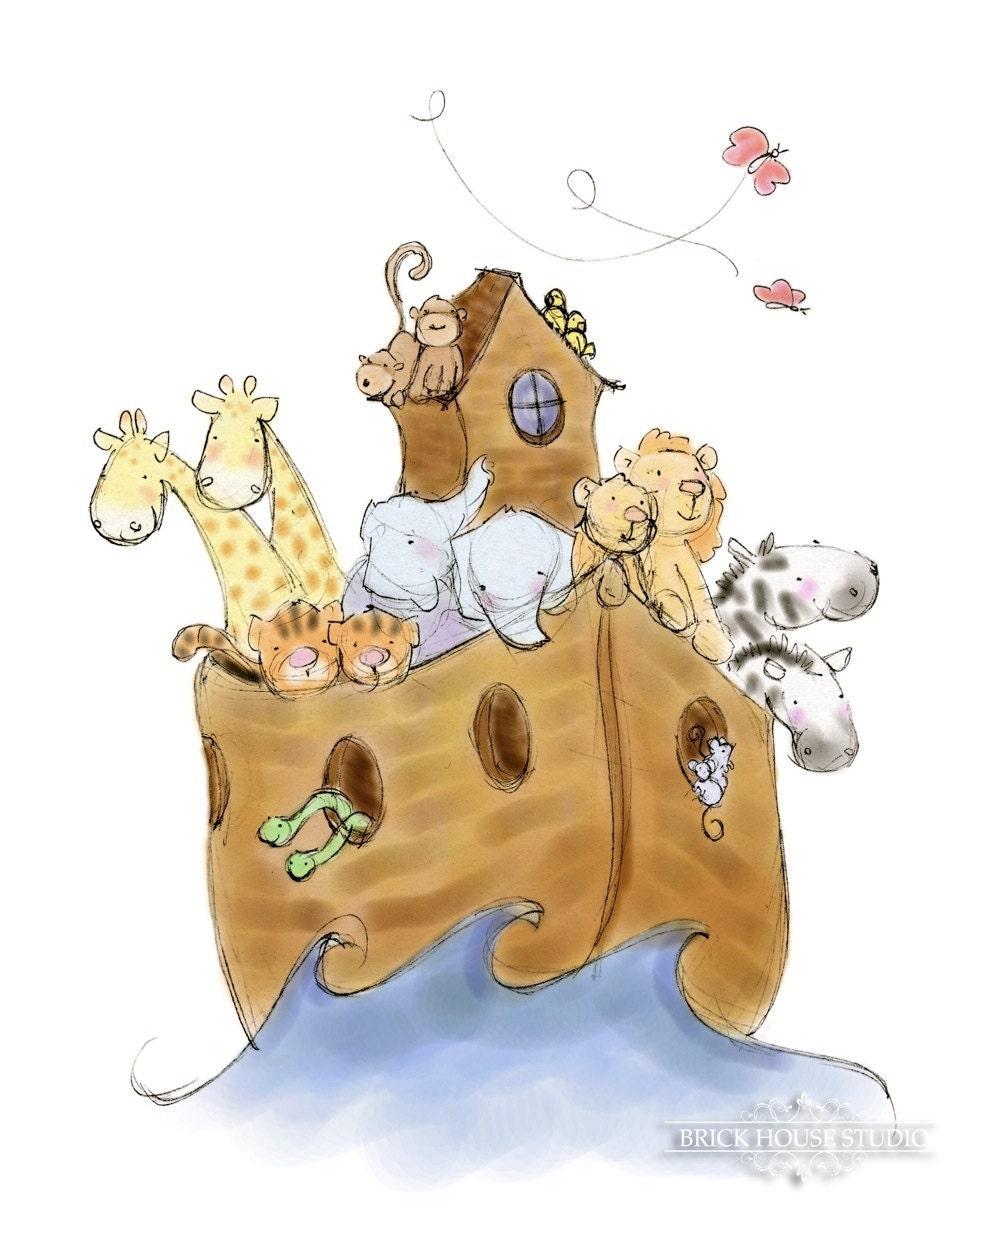 Church Nursery Pictures Google Search: Noahs Ark Baby Room On Pinterest